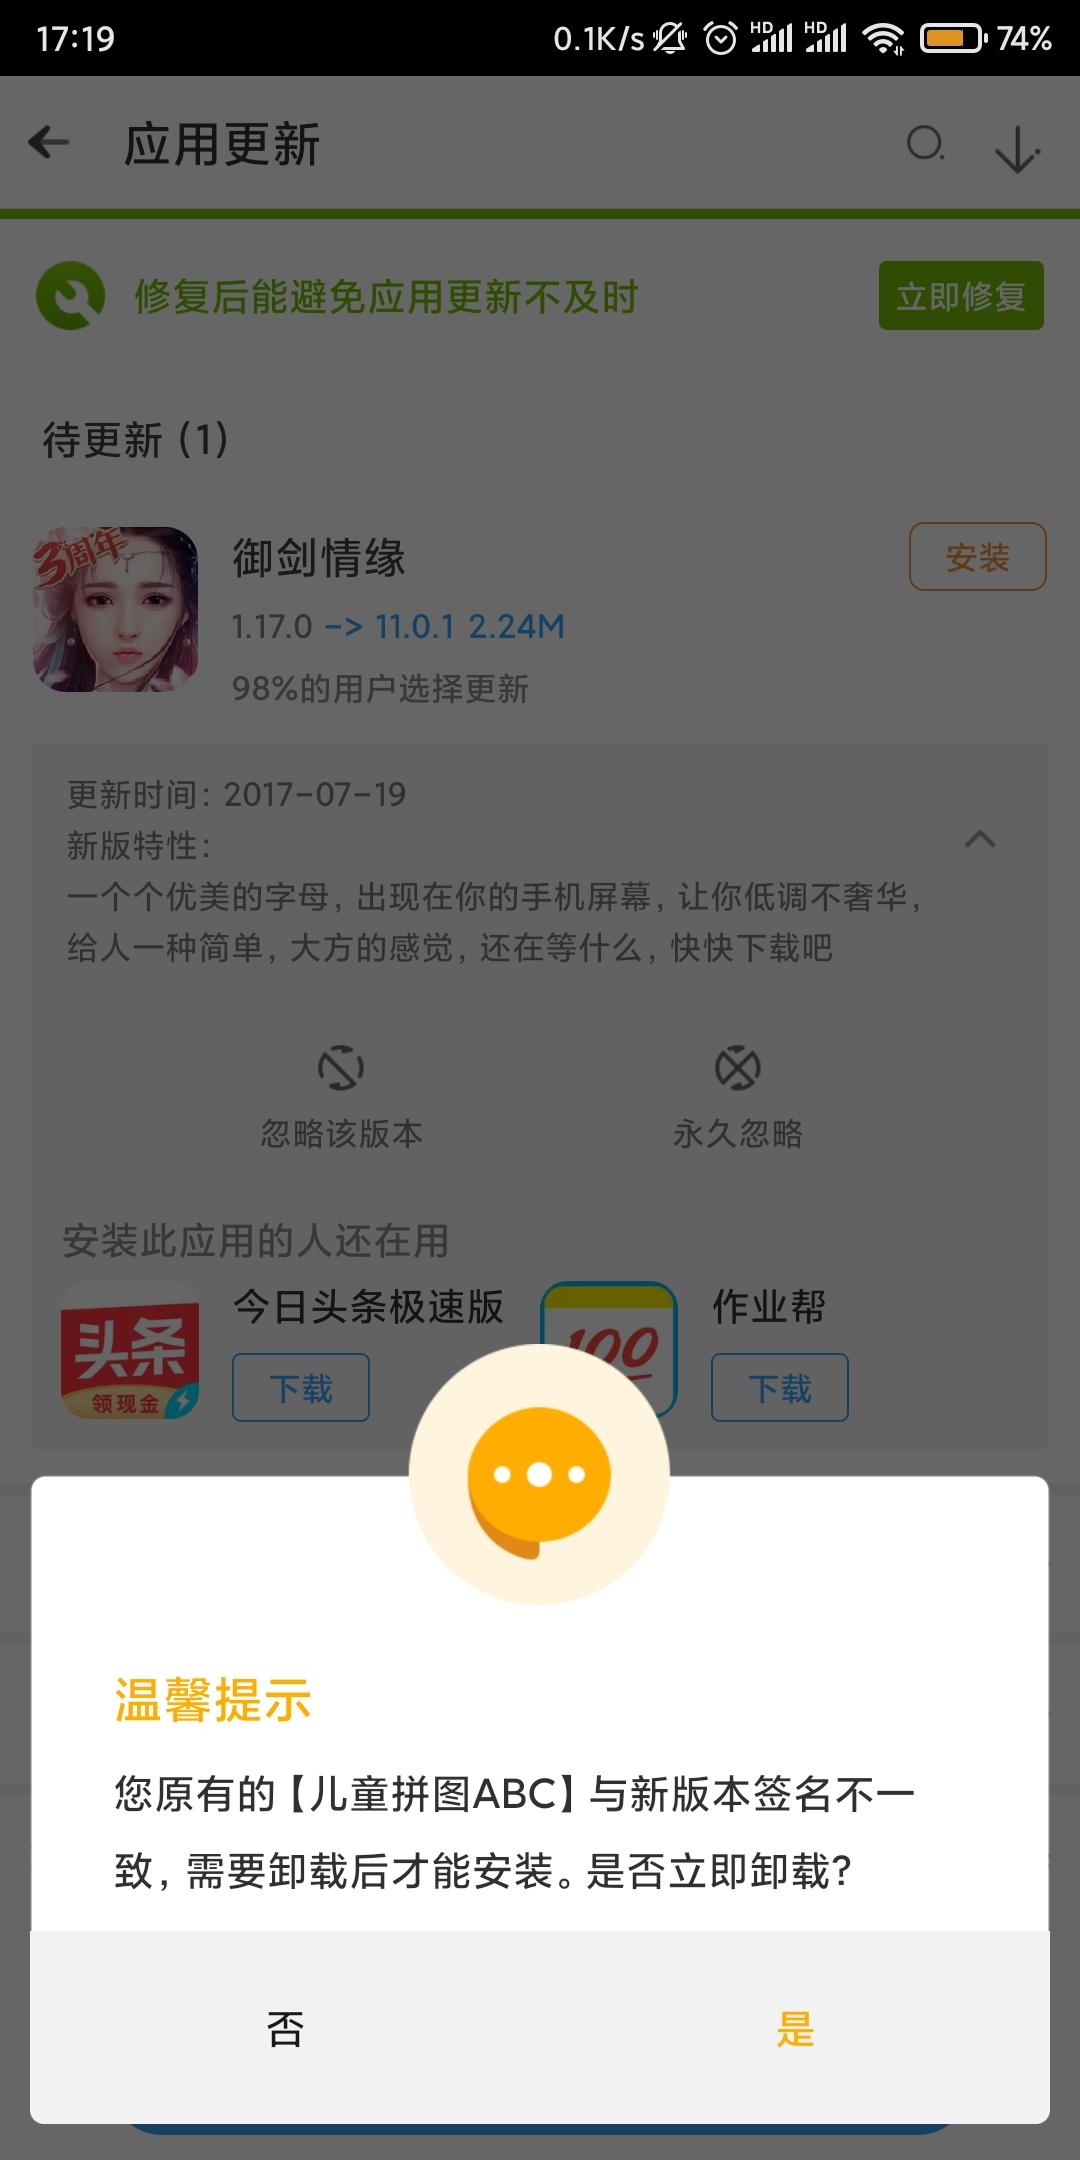 Screenshot_2020-01-15-17-19-02-839_com.qihoo.appstore.jpg